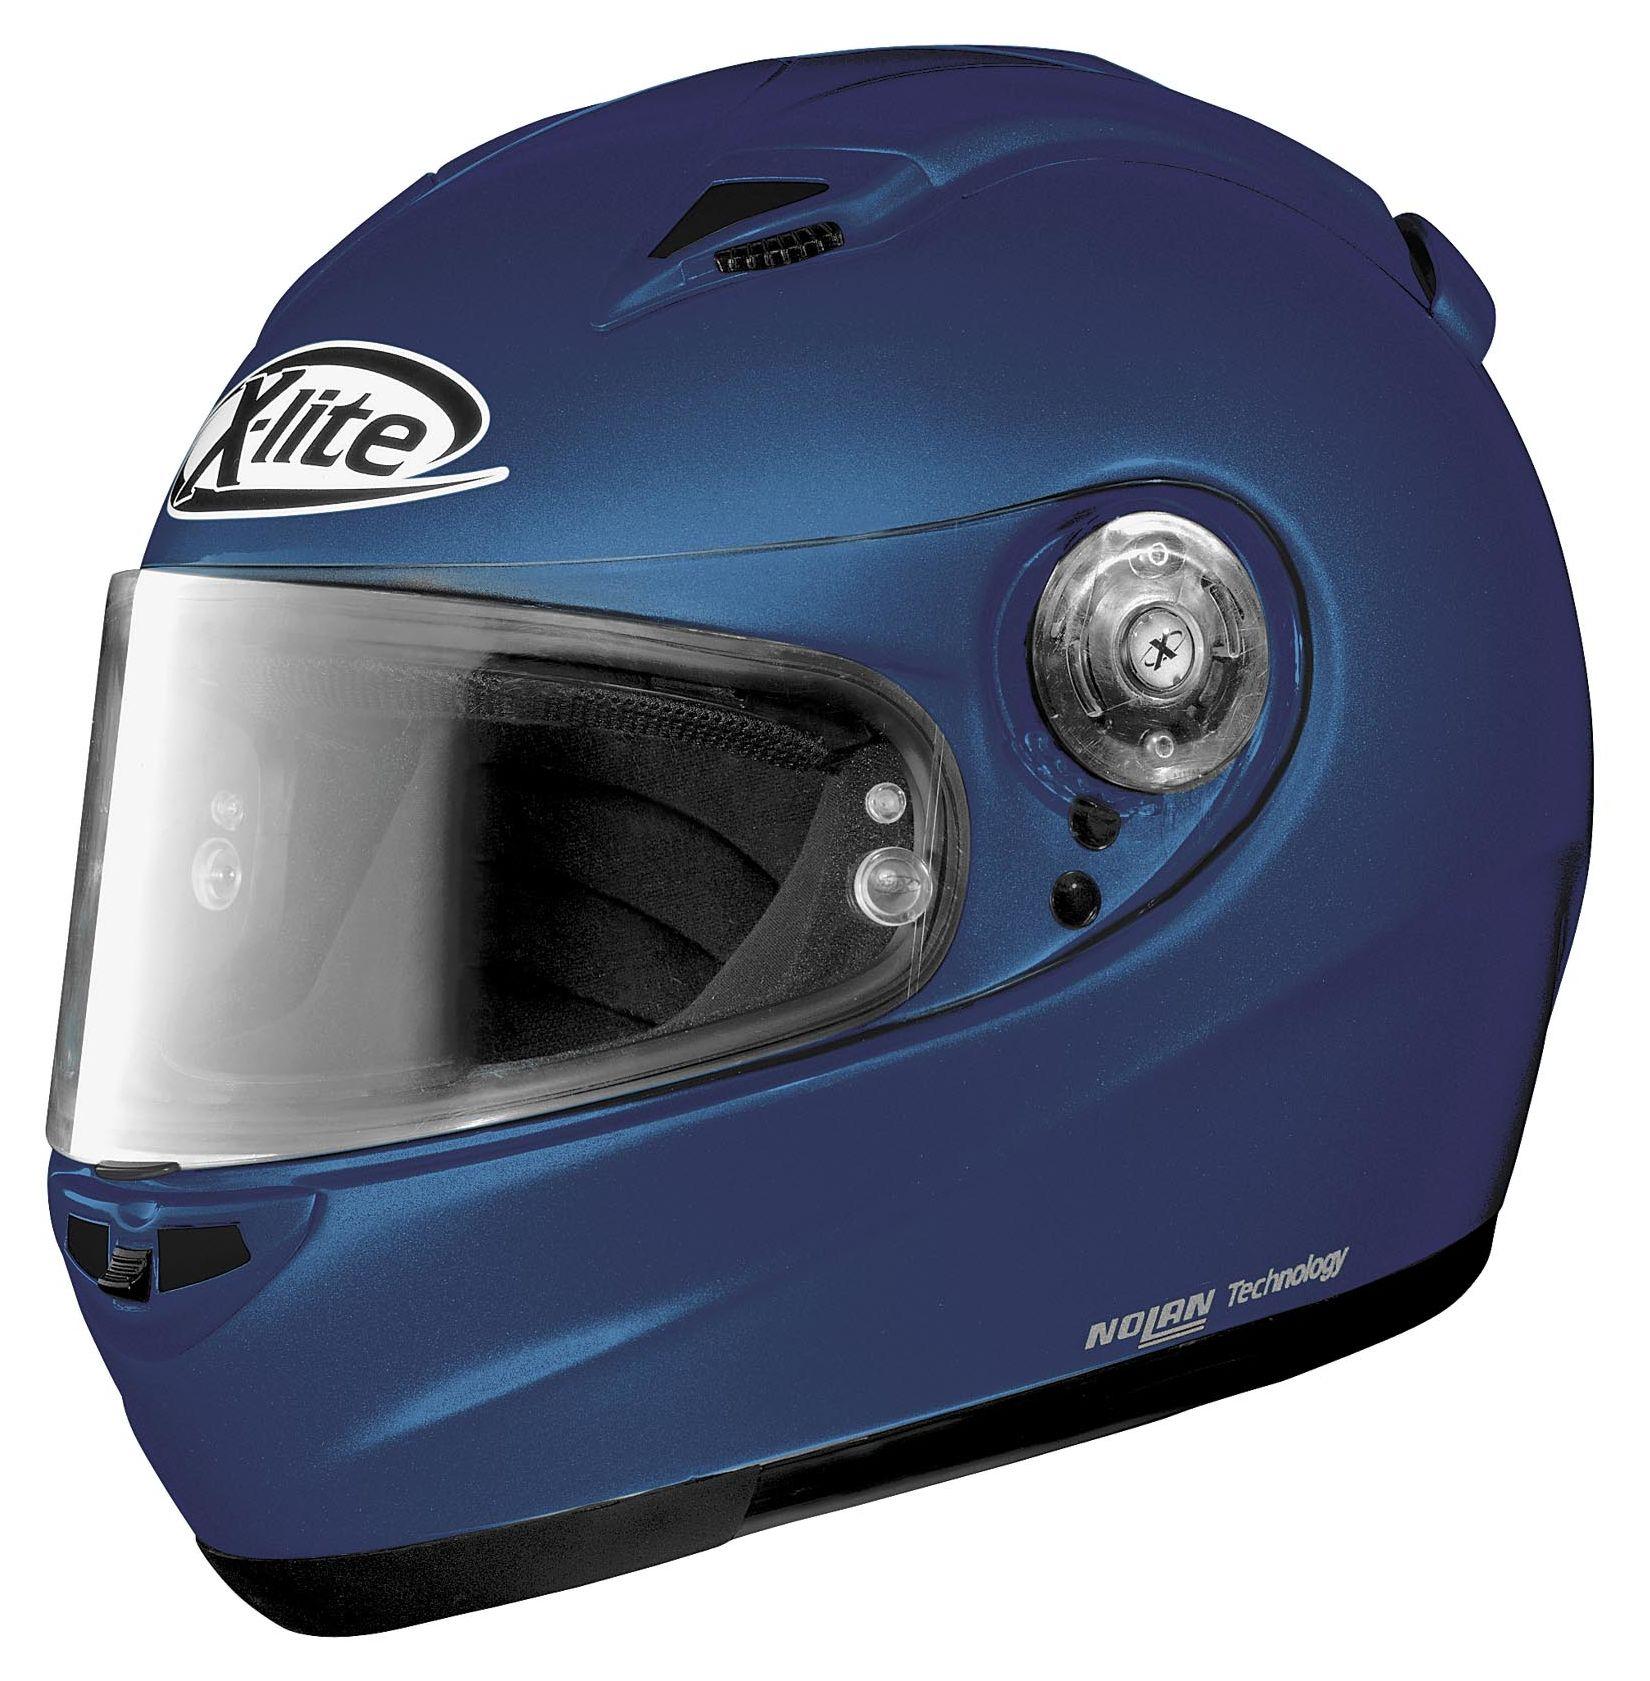 nolan x lite x 801 blue helmet revzilla. Black Bedroom Furniture Sets. Home Design Ideas